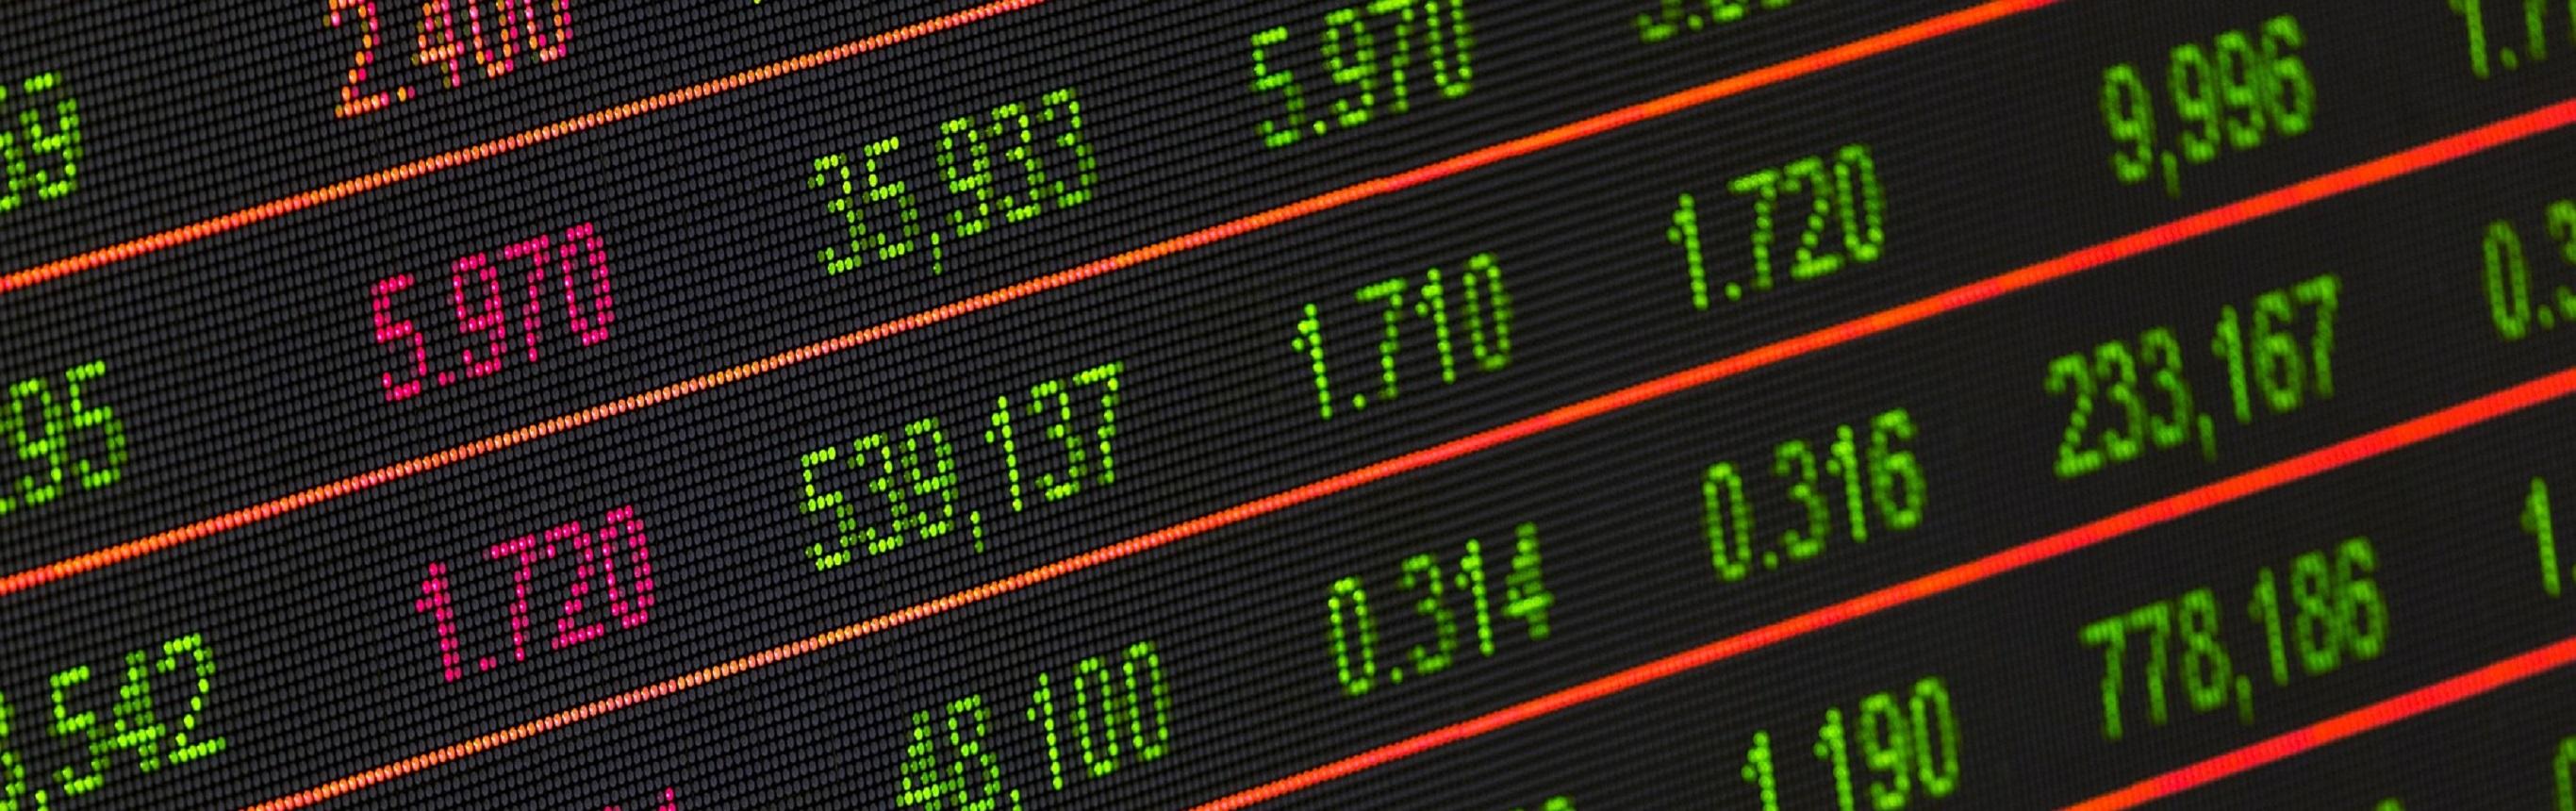 5 AIM Stocks to Buy